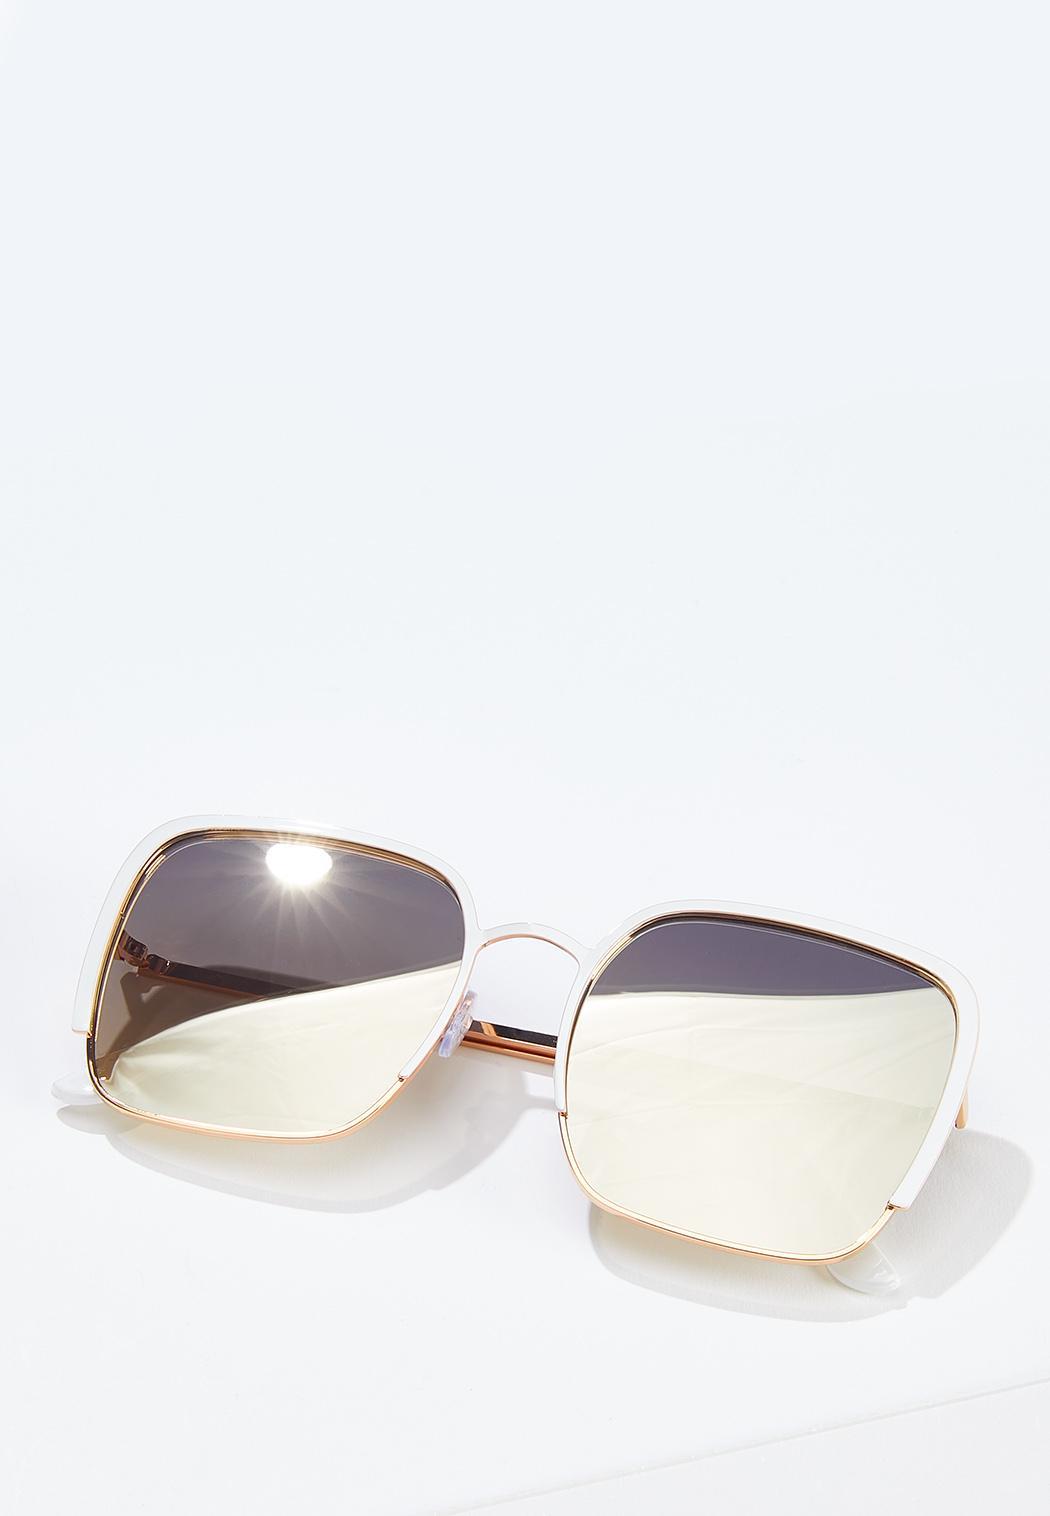 Mod Square Sunglasses